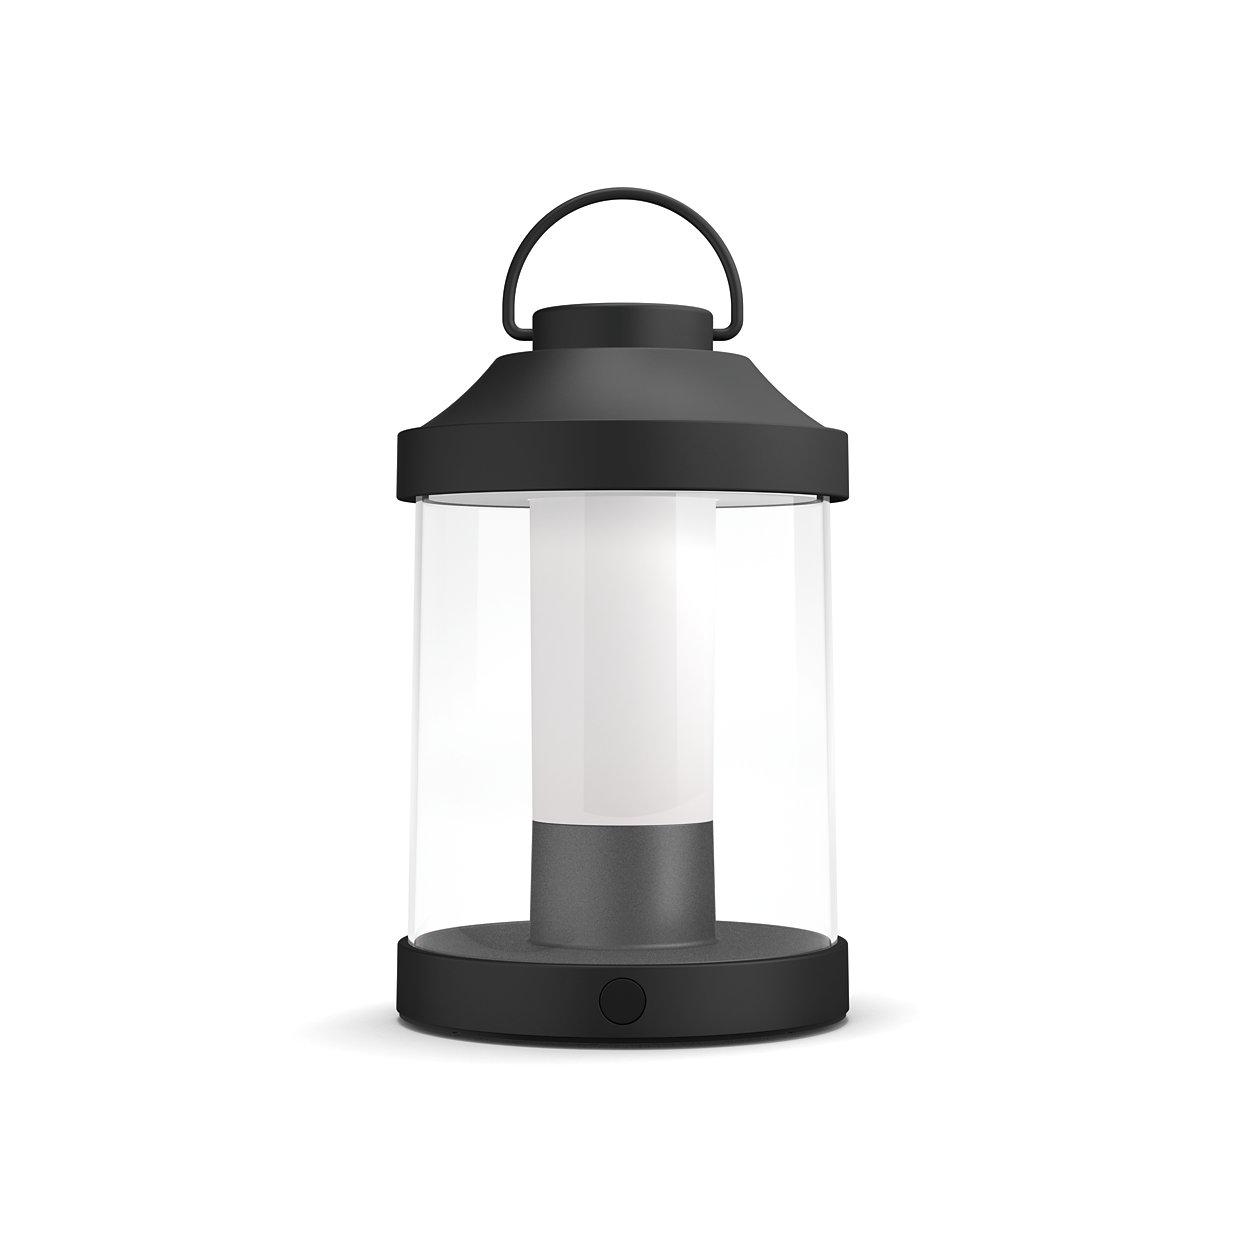 Mygarden Lampe Poser Mygarden 1736030p0Philips À nvwN0m8